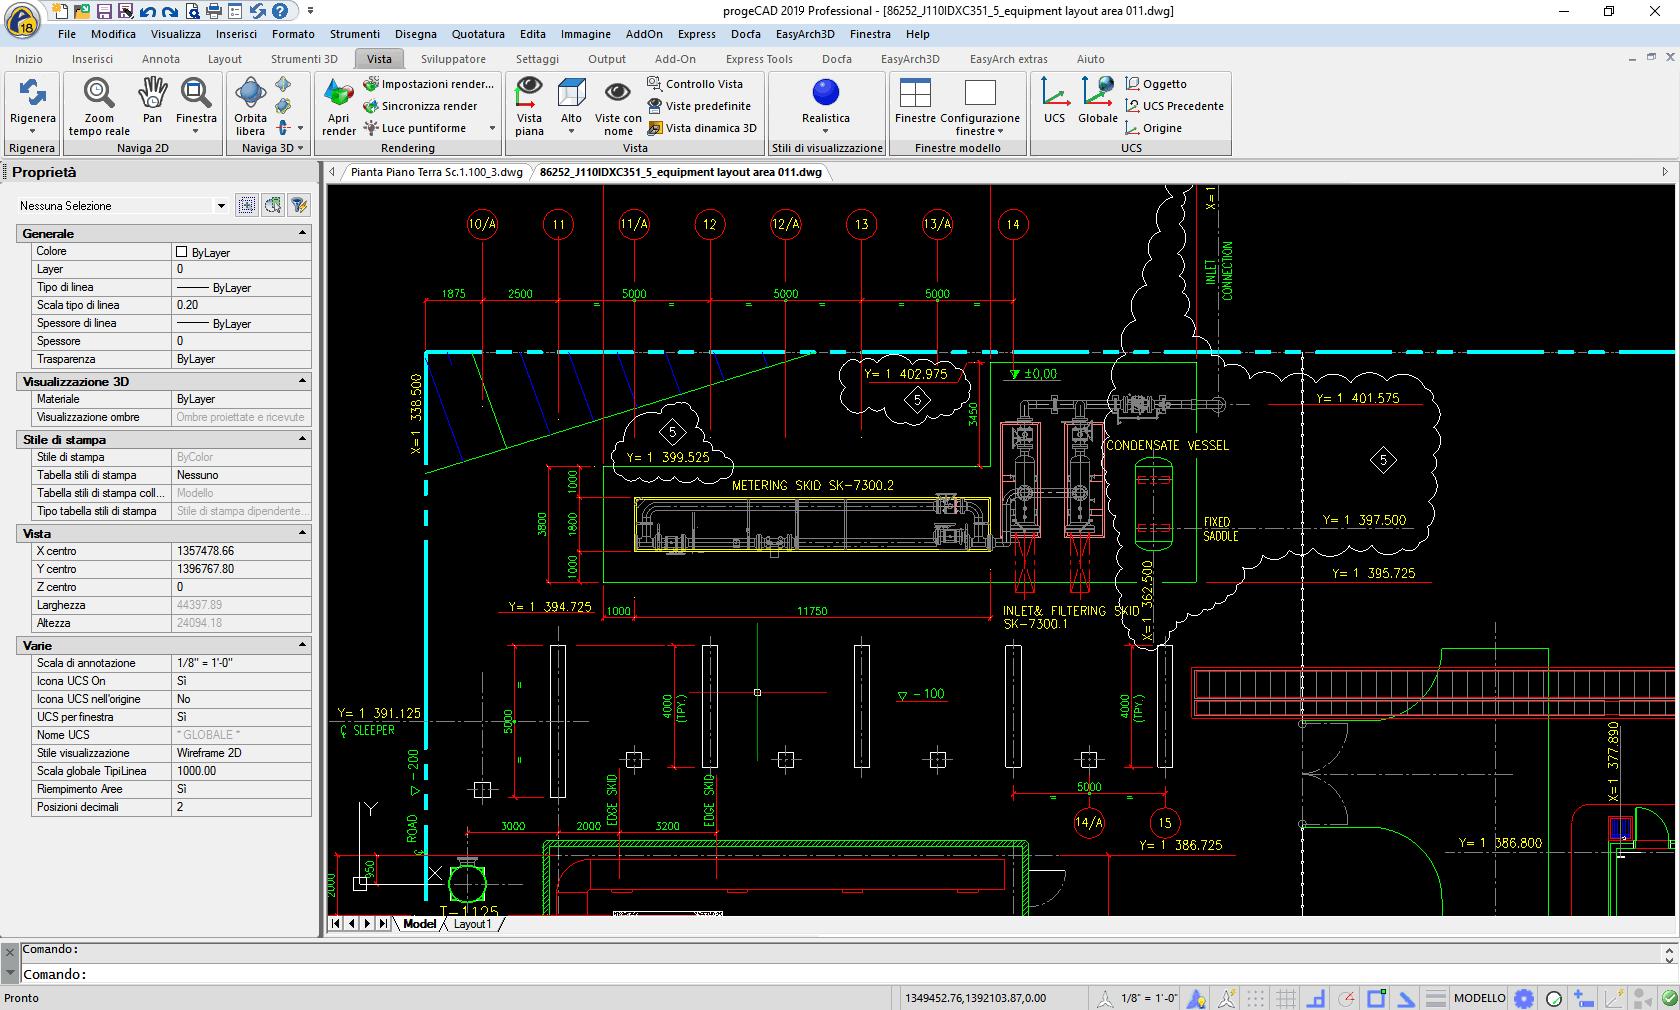 Design with progeCAD 2019 Professional x64 full crack